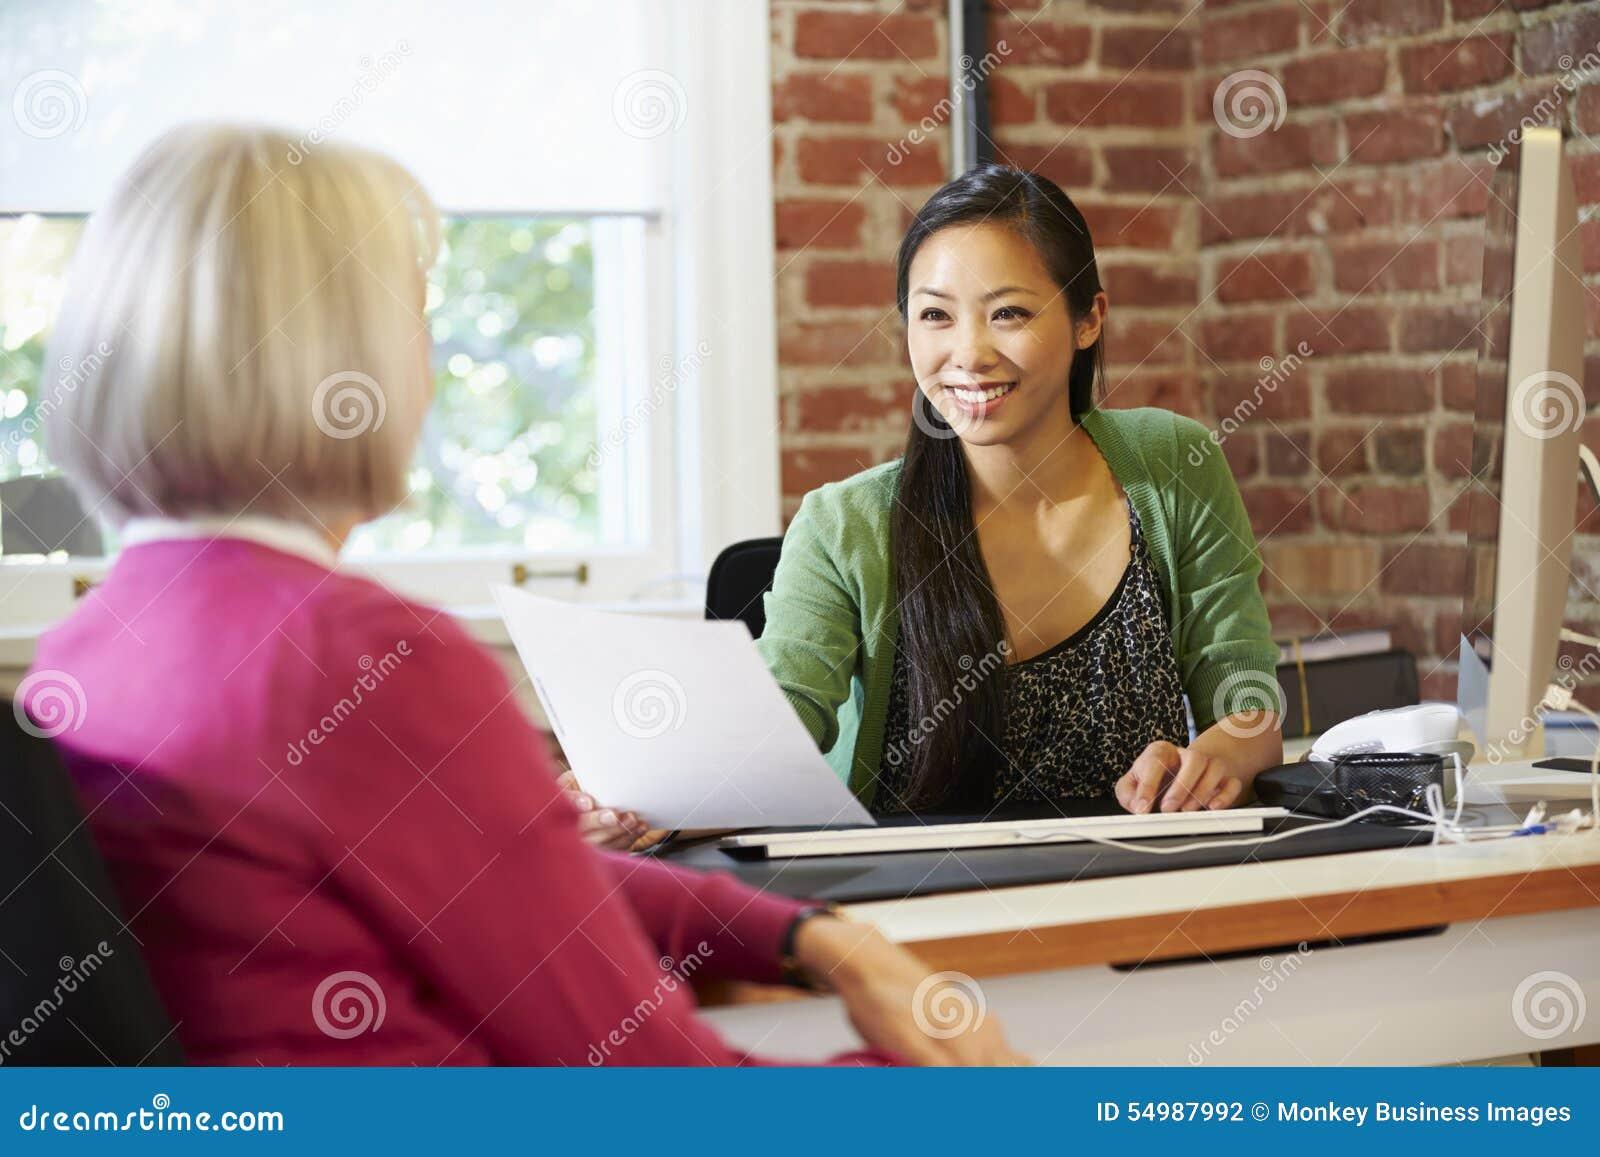 Affärskvinna Interviewing Female Job Applicant In Office